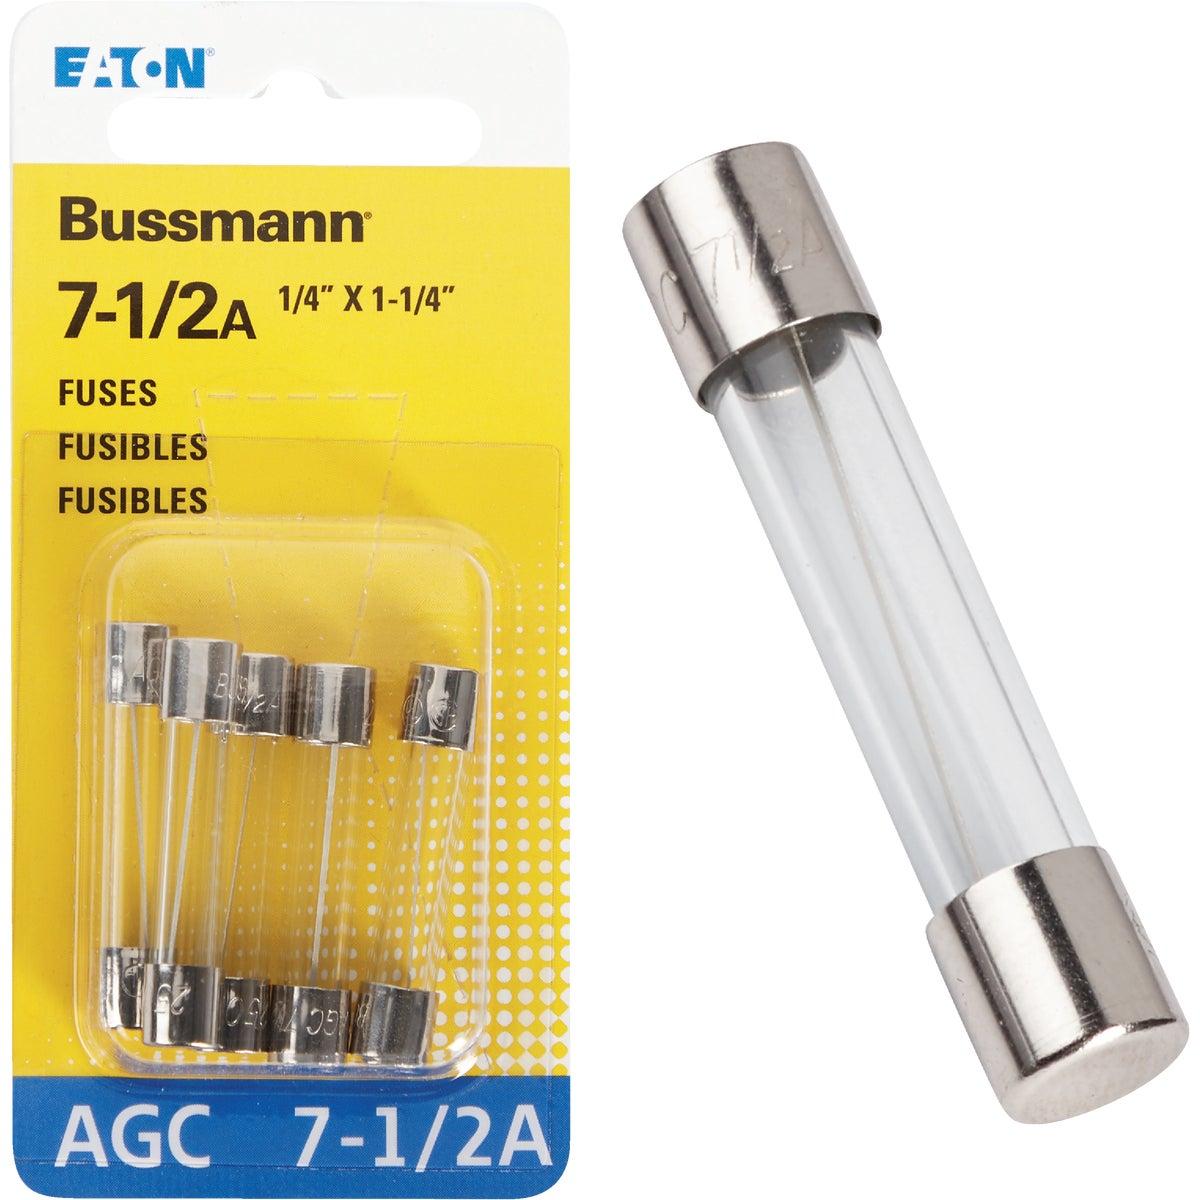 7-1/2AMP FUSE - BP/AGC-7-1/2-RP by Bussmann Cooper